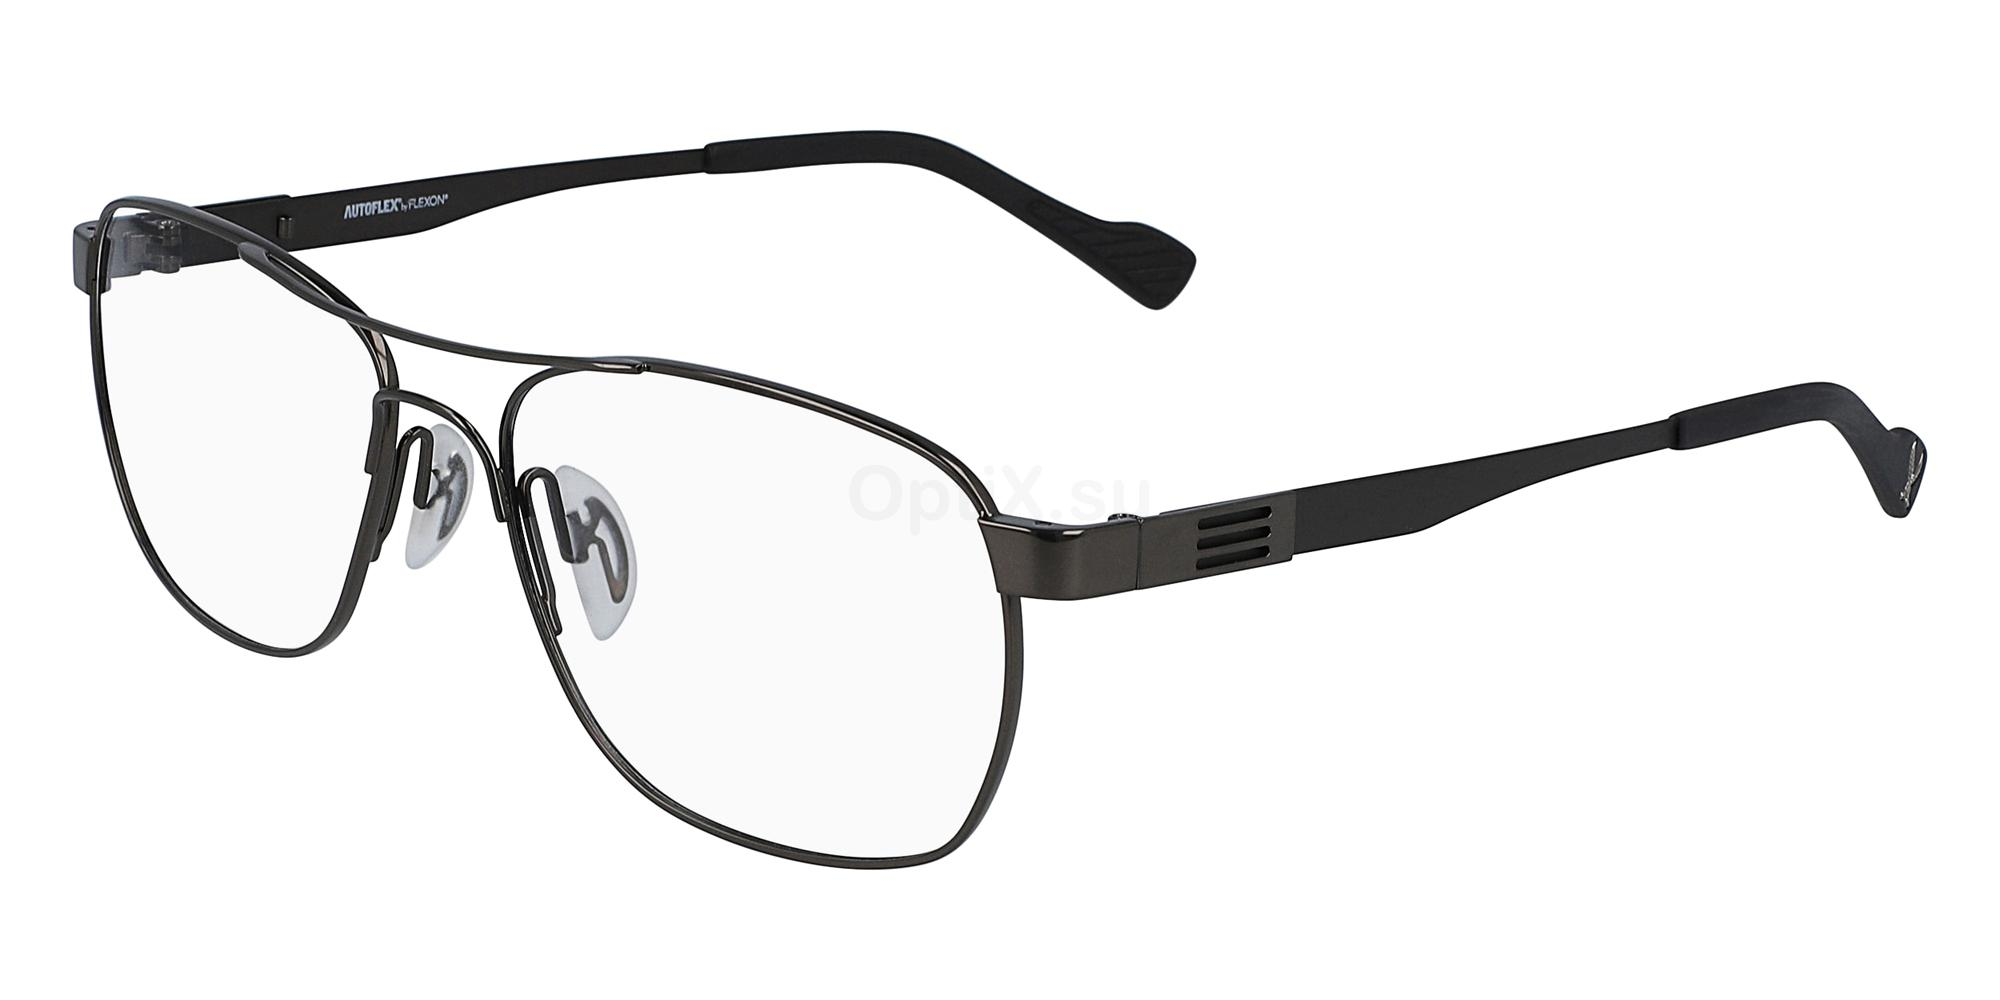 001 AUTOFLEX 113 Glasses, Flexon